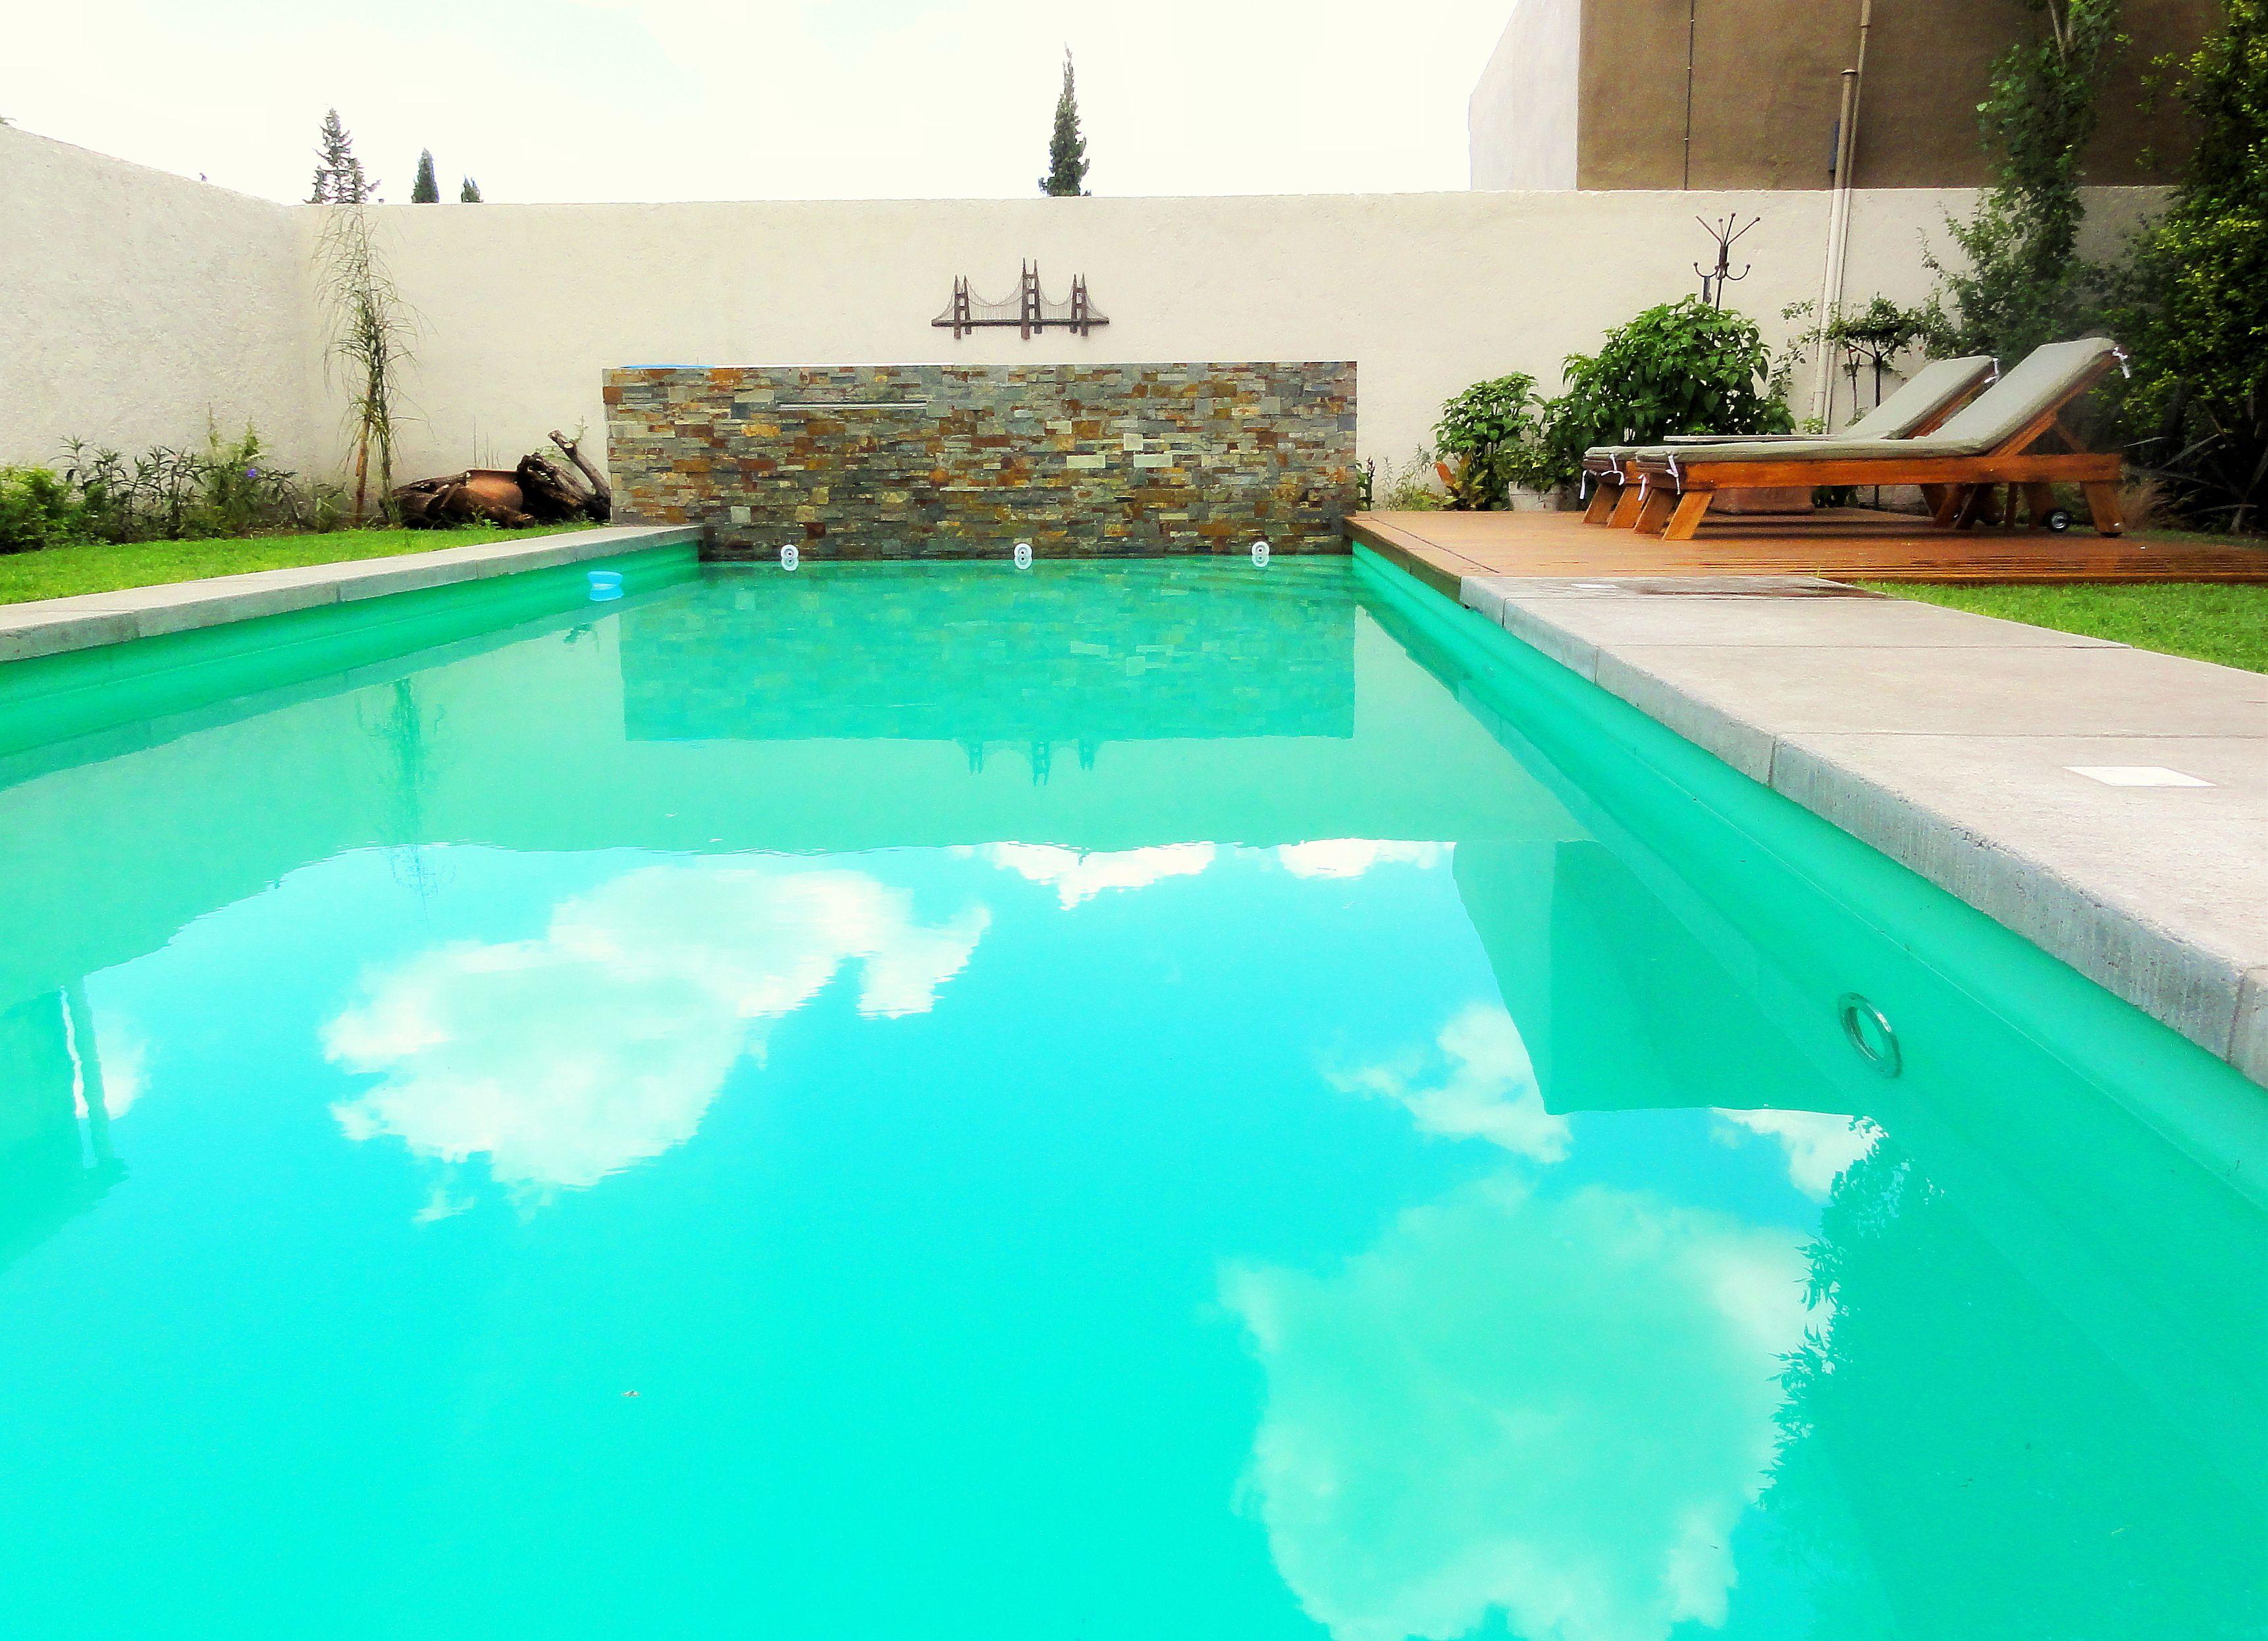 piscina familiar - cordoba - argentina - revestimiento en piedra